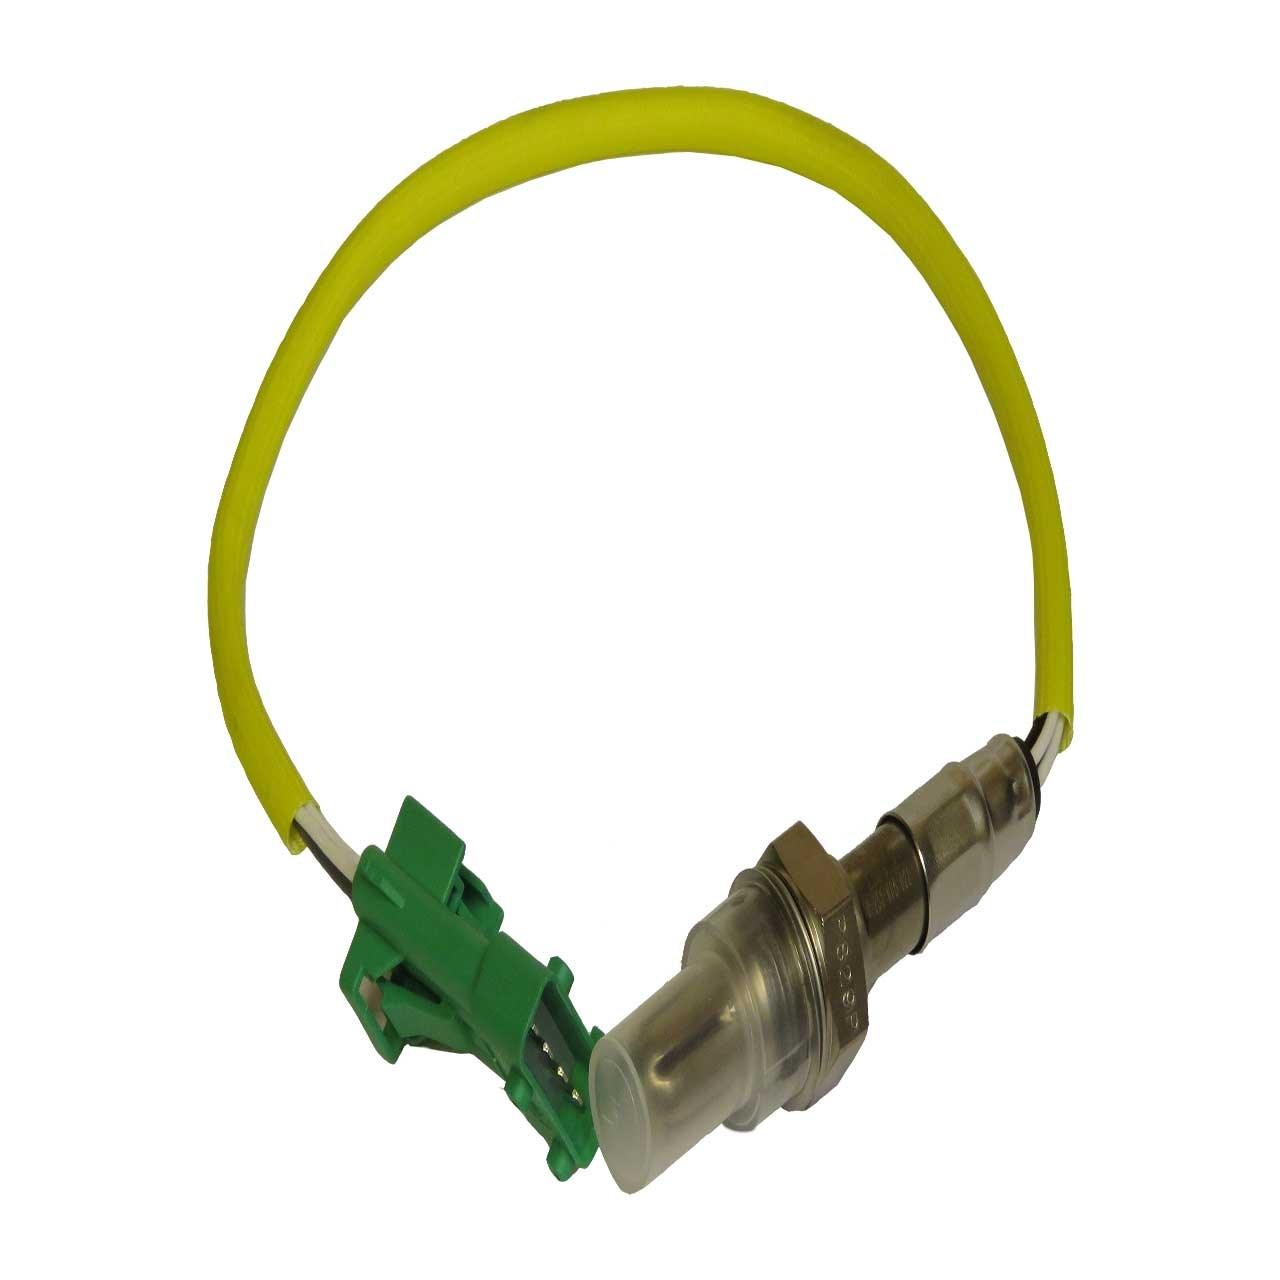 سنسور اکسیژن پی اچ سی والیو مدل 027 مناسب برای پژو 206